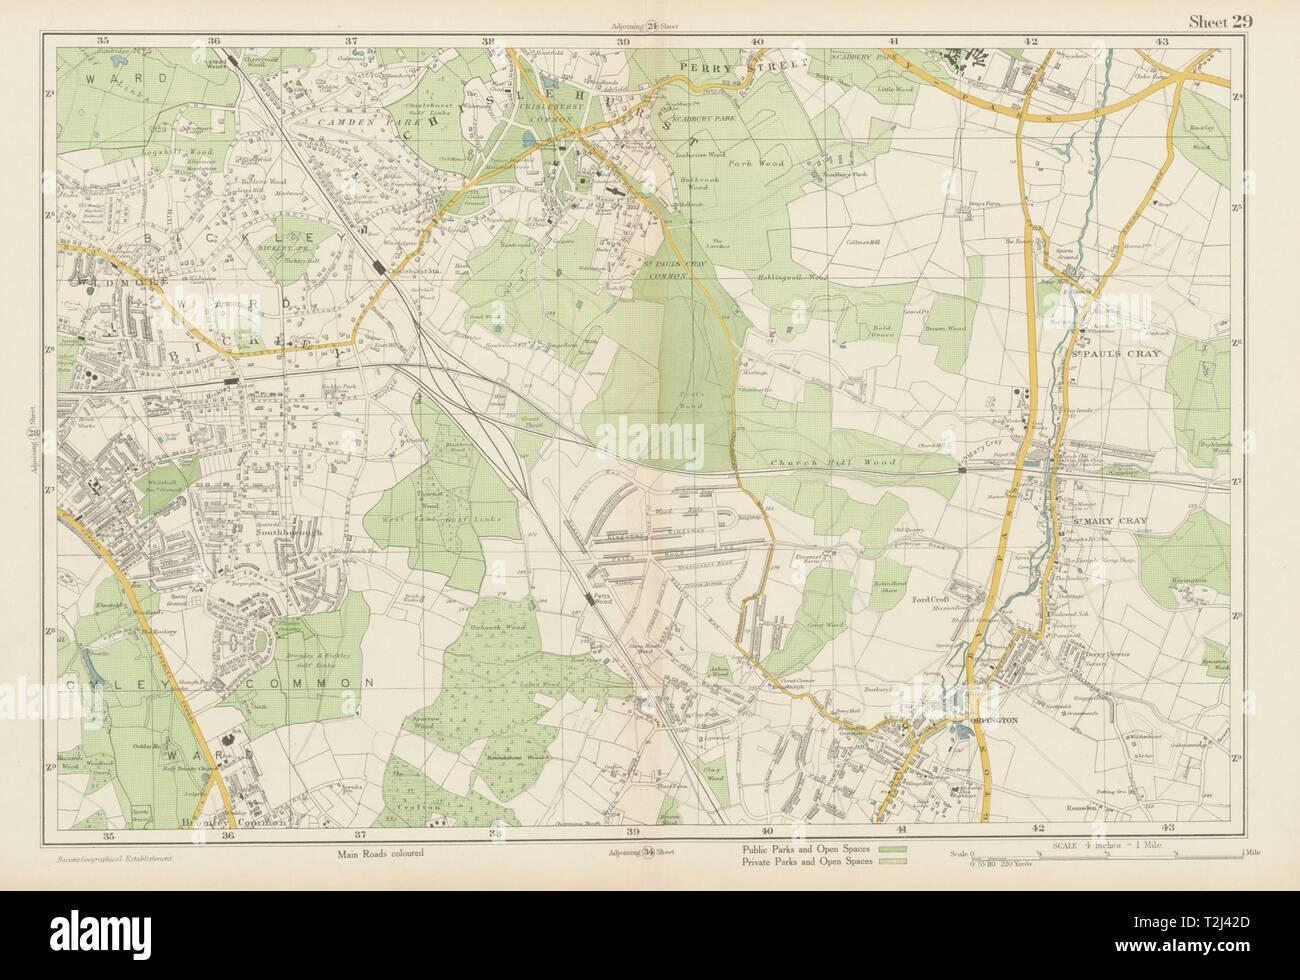 BROMLEY & ORPINGTON Chislehurst Petts Wood St Paul's Mary Cray. BACON 1934 map - Stock Image